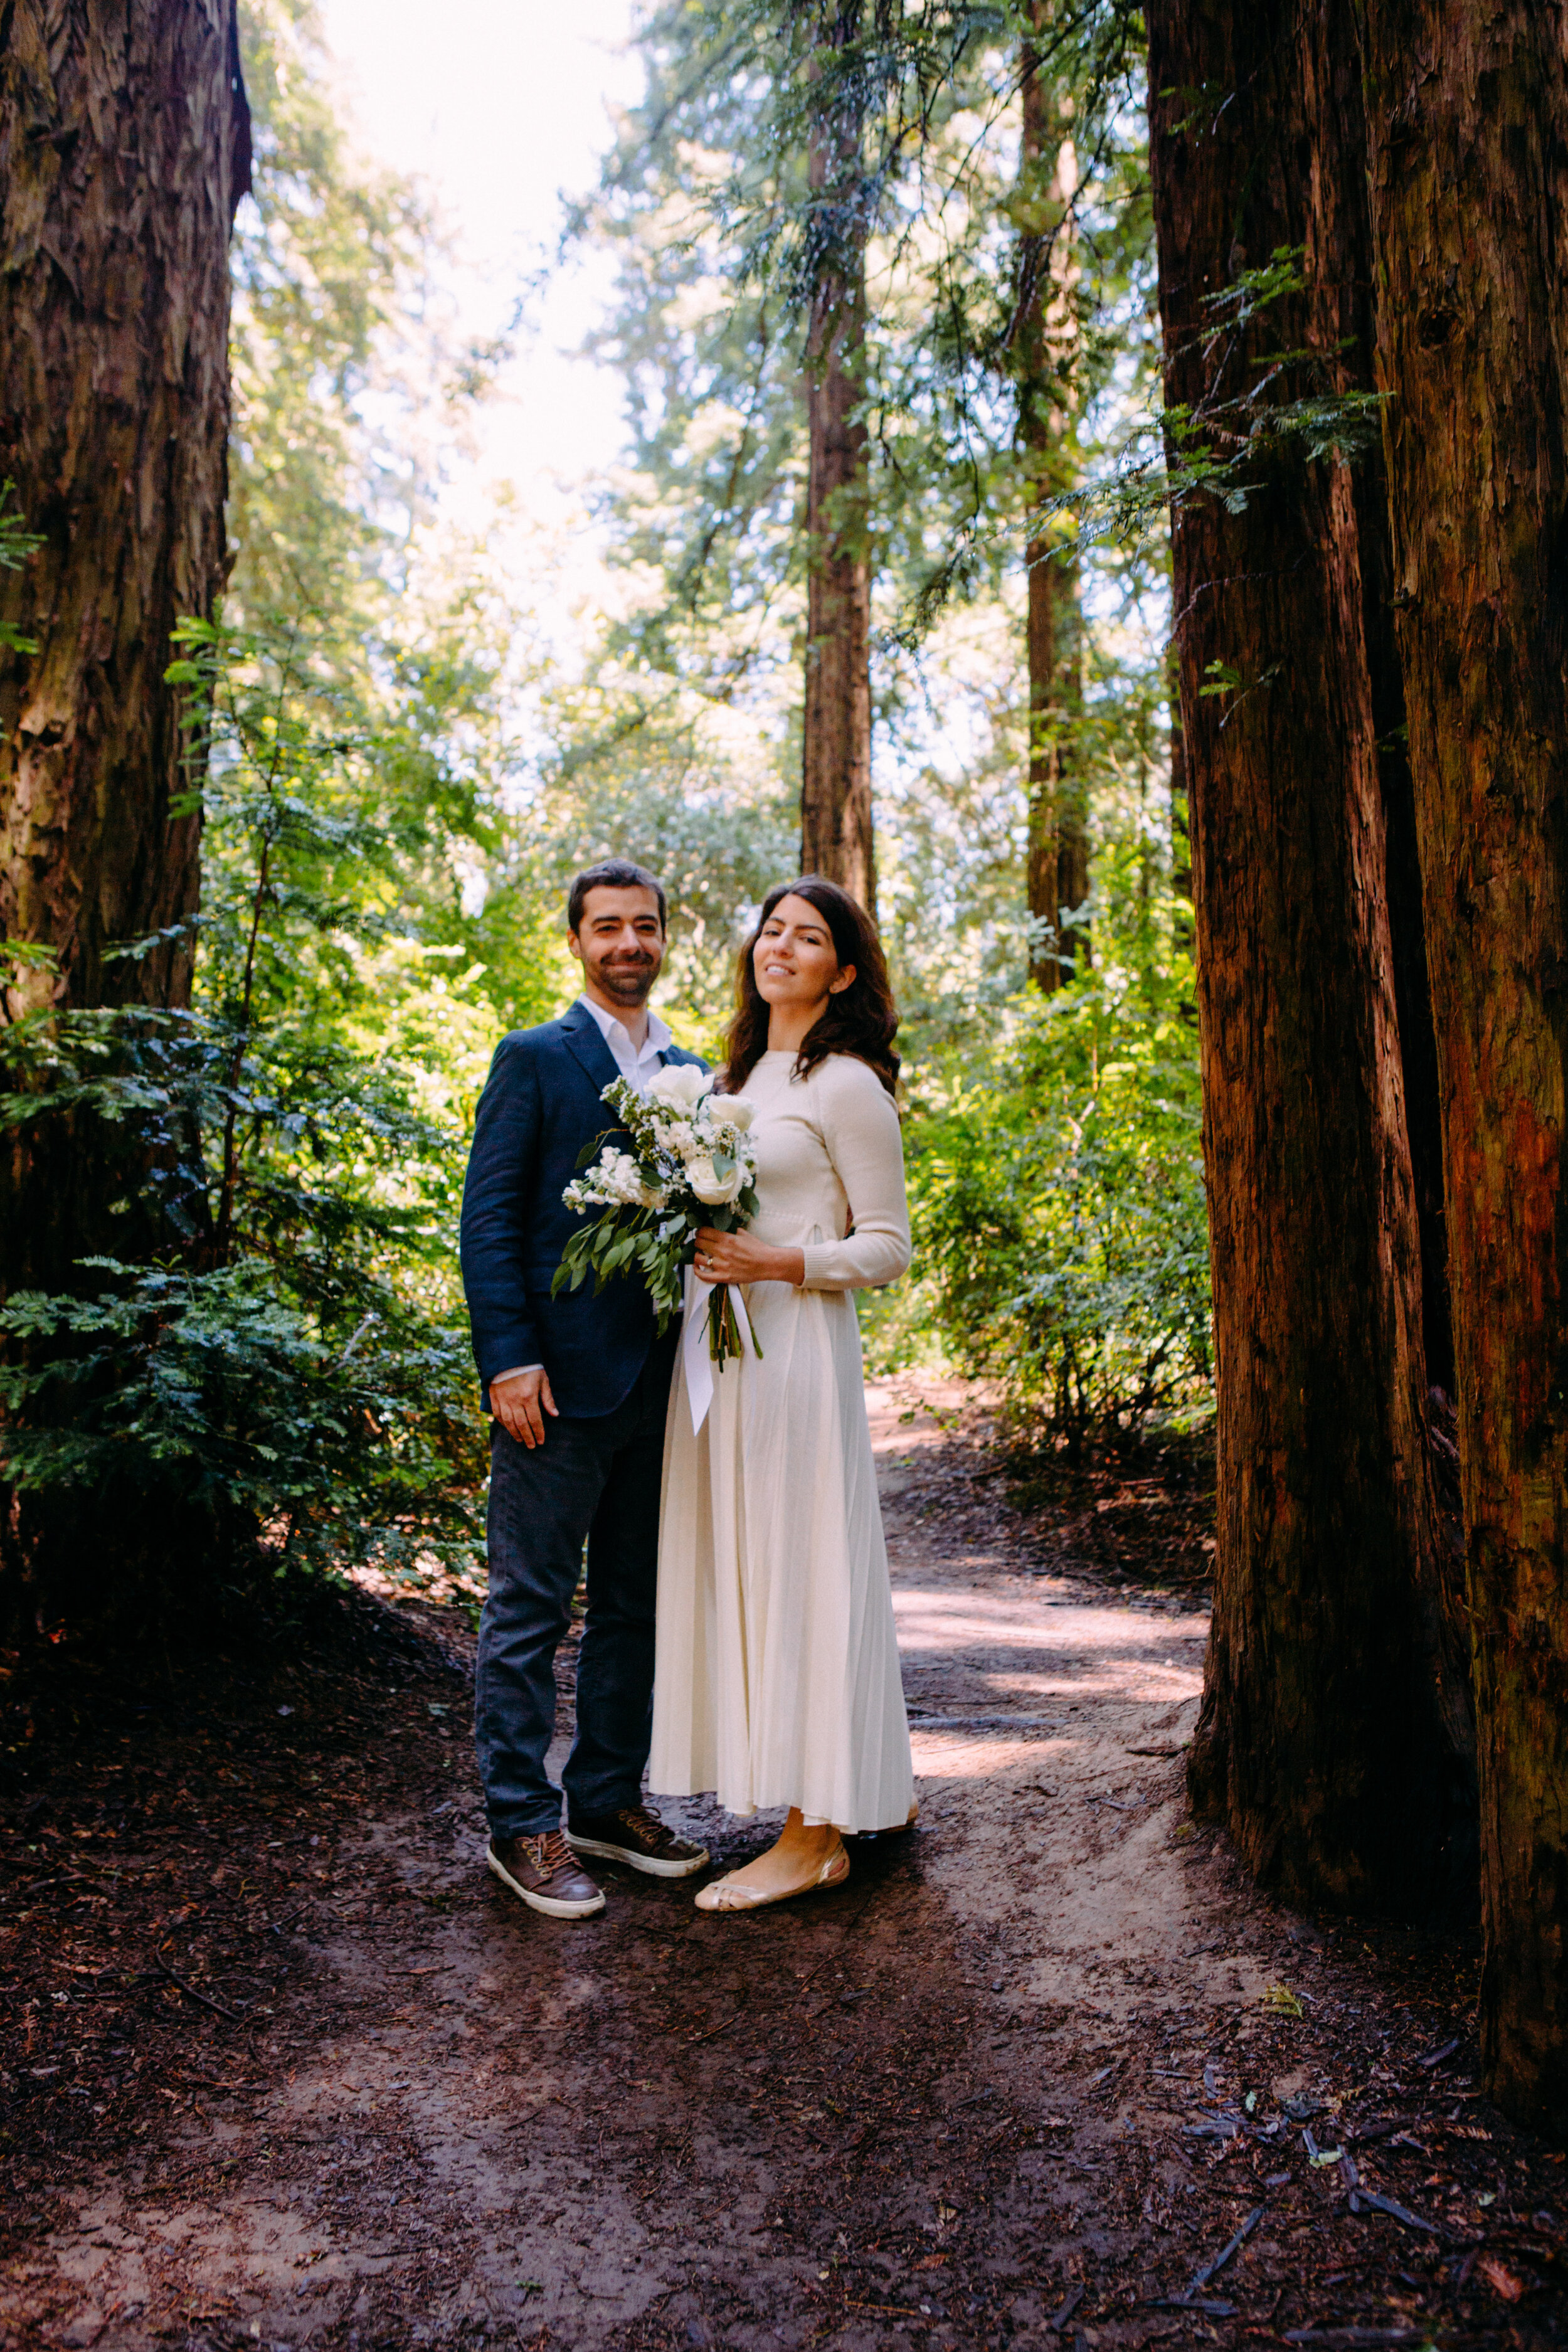 20190716-San Francisco-Redwood Regional Park-Marcella Daniele--73.jpg